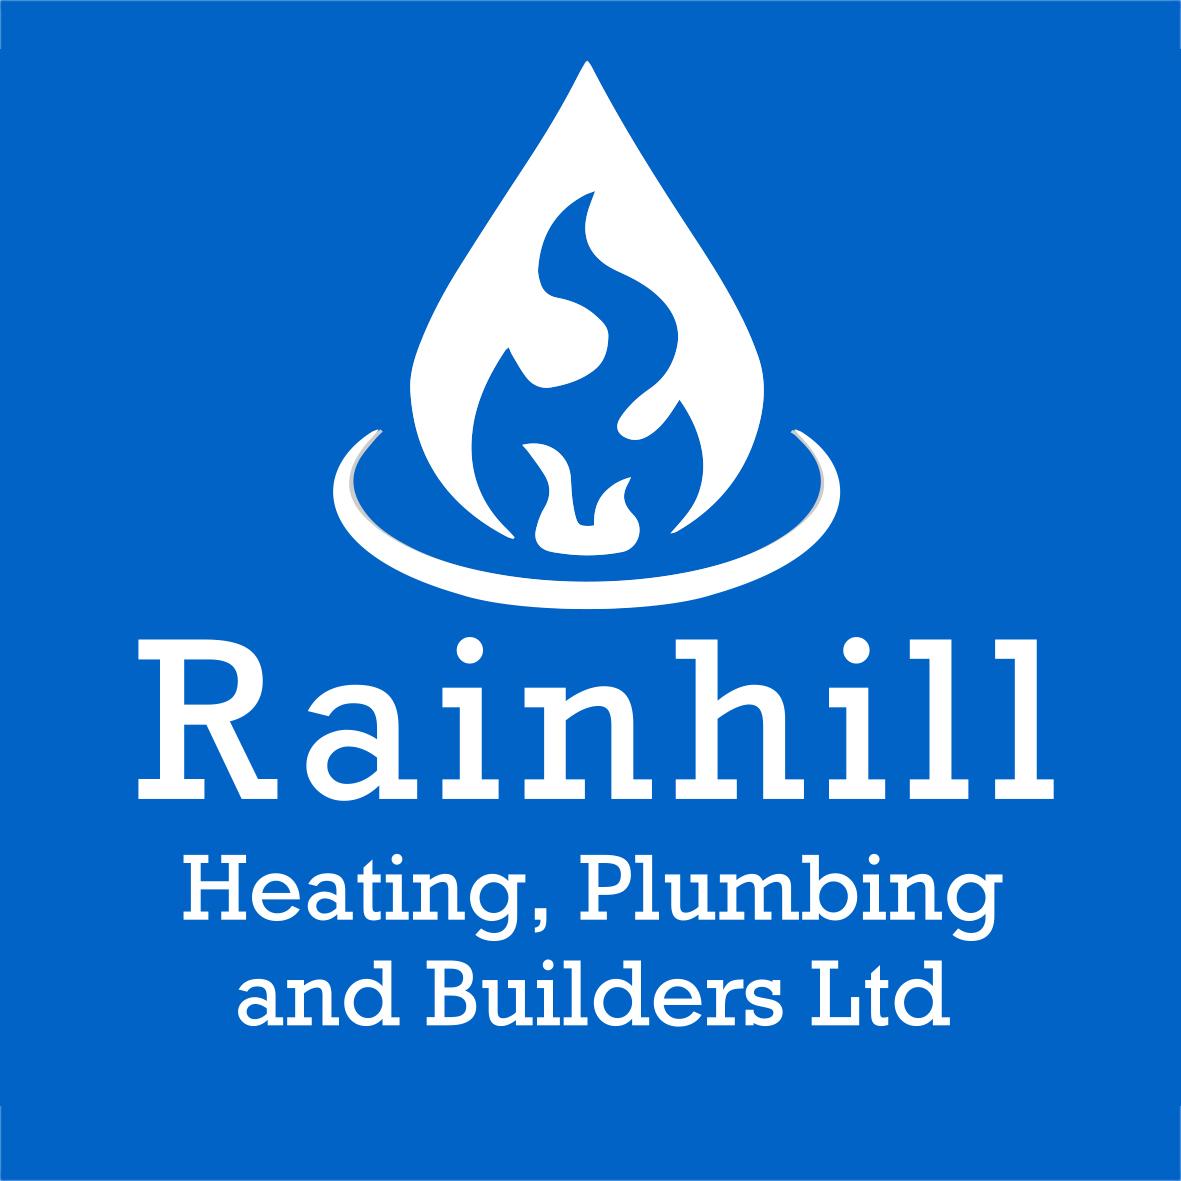 Rainhill Heating, Plumbing And Builders Ltd Verified Logo